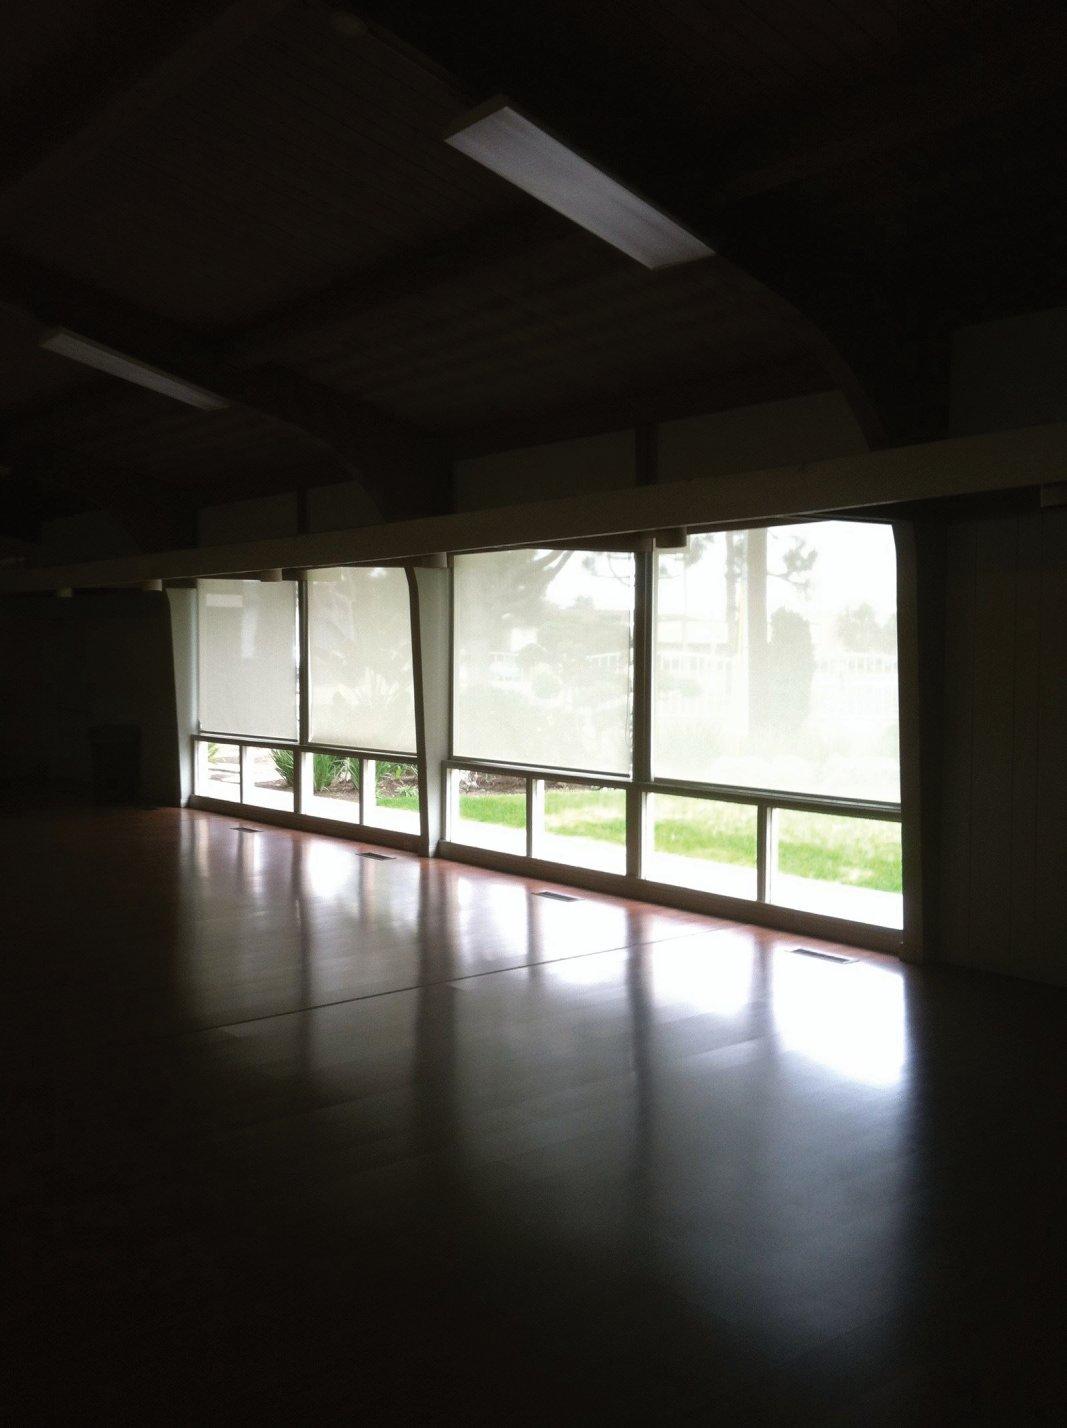 Large window view